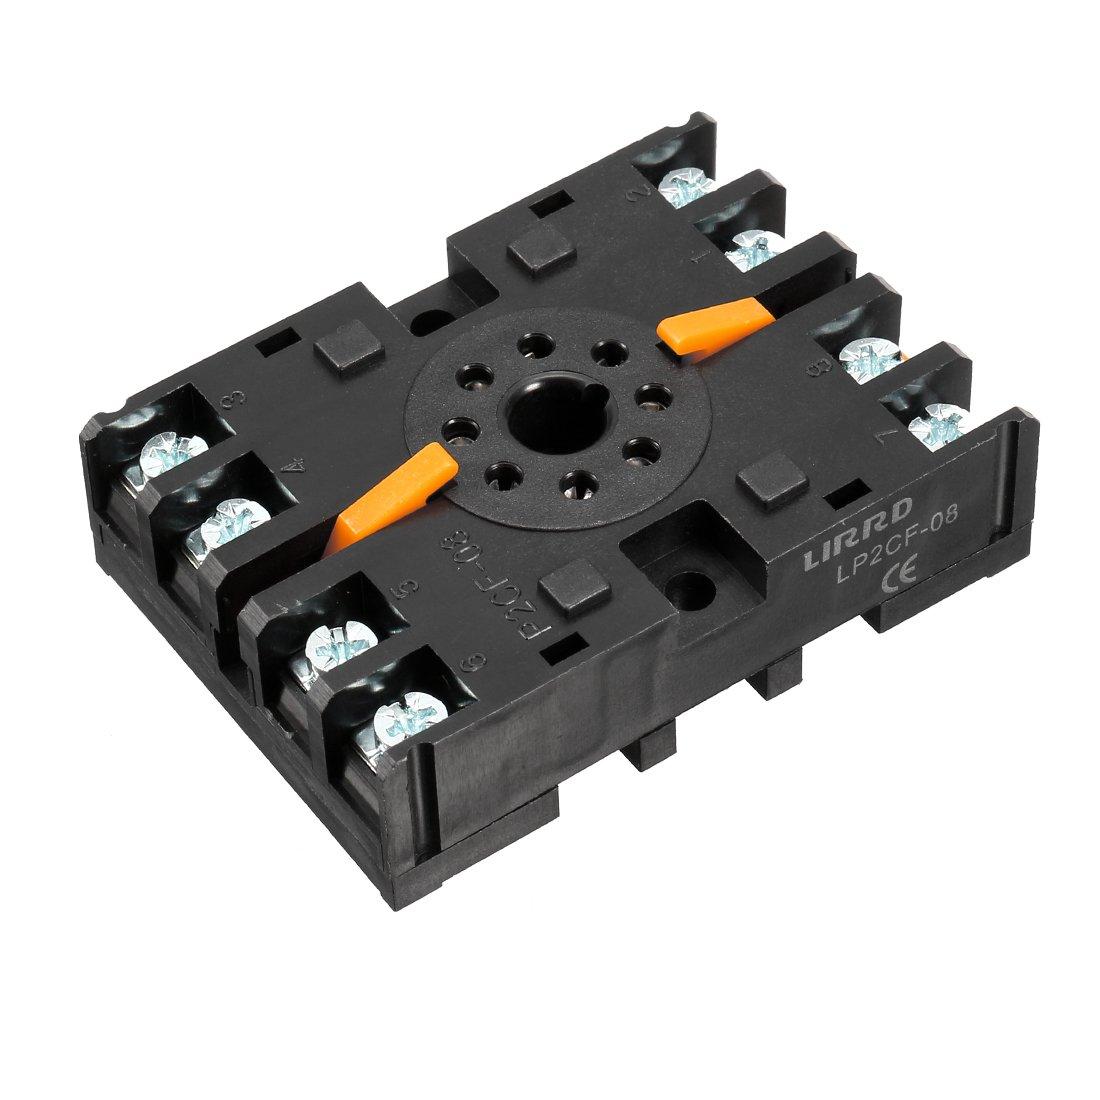 pin removal impala fuse box wiring diagram SRX Fuse Box pin removal impala fuse box